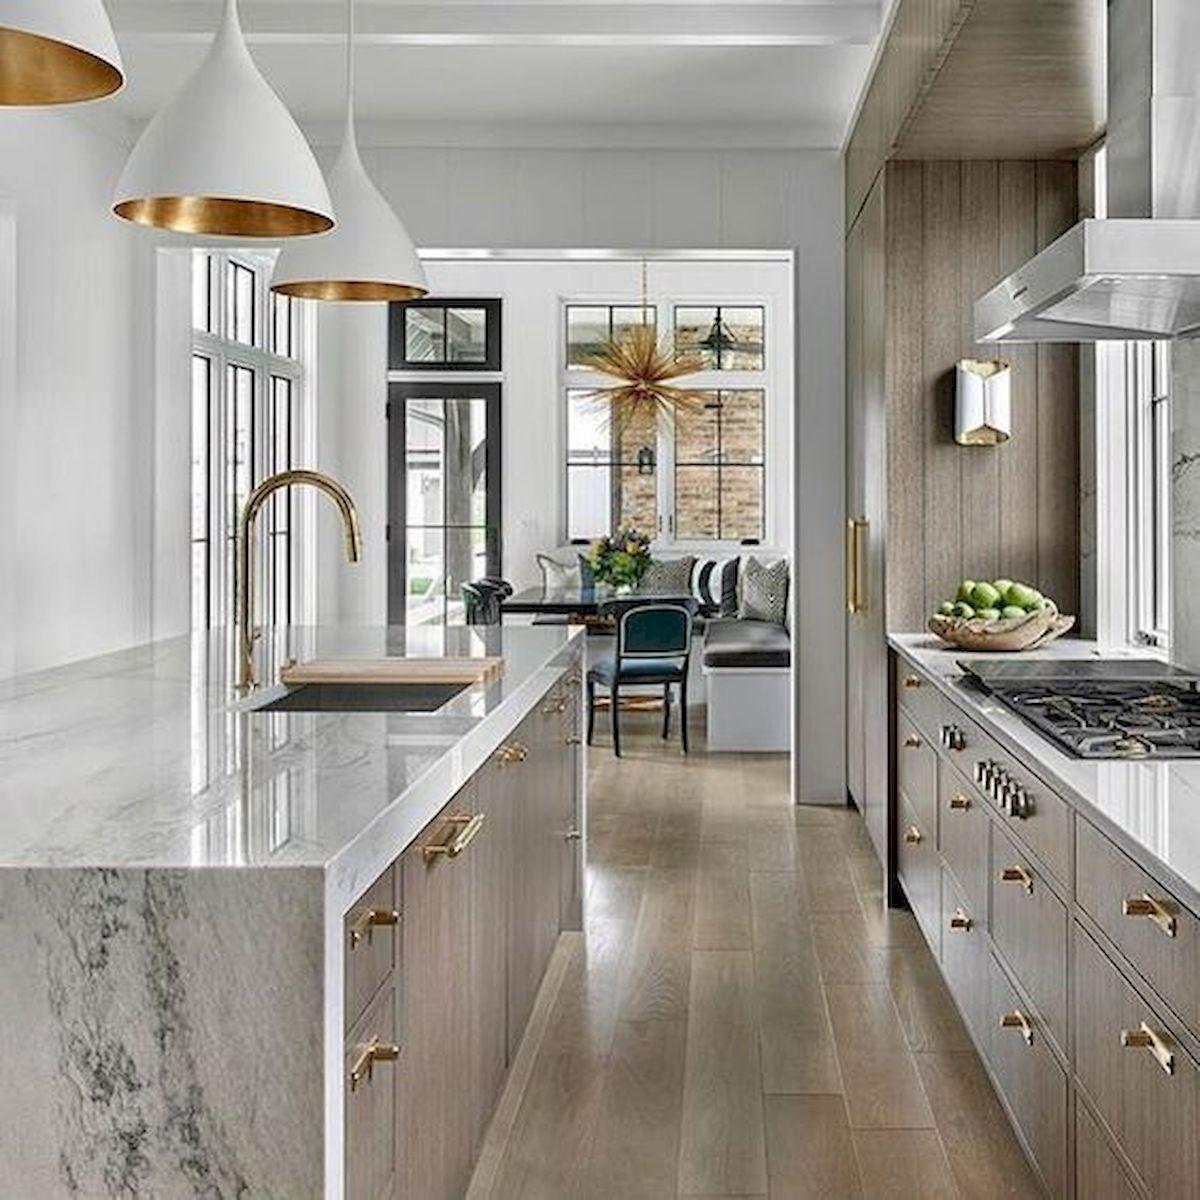 45 Easy Kitchen Decor and Design Ideas (27)